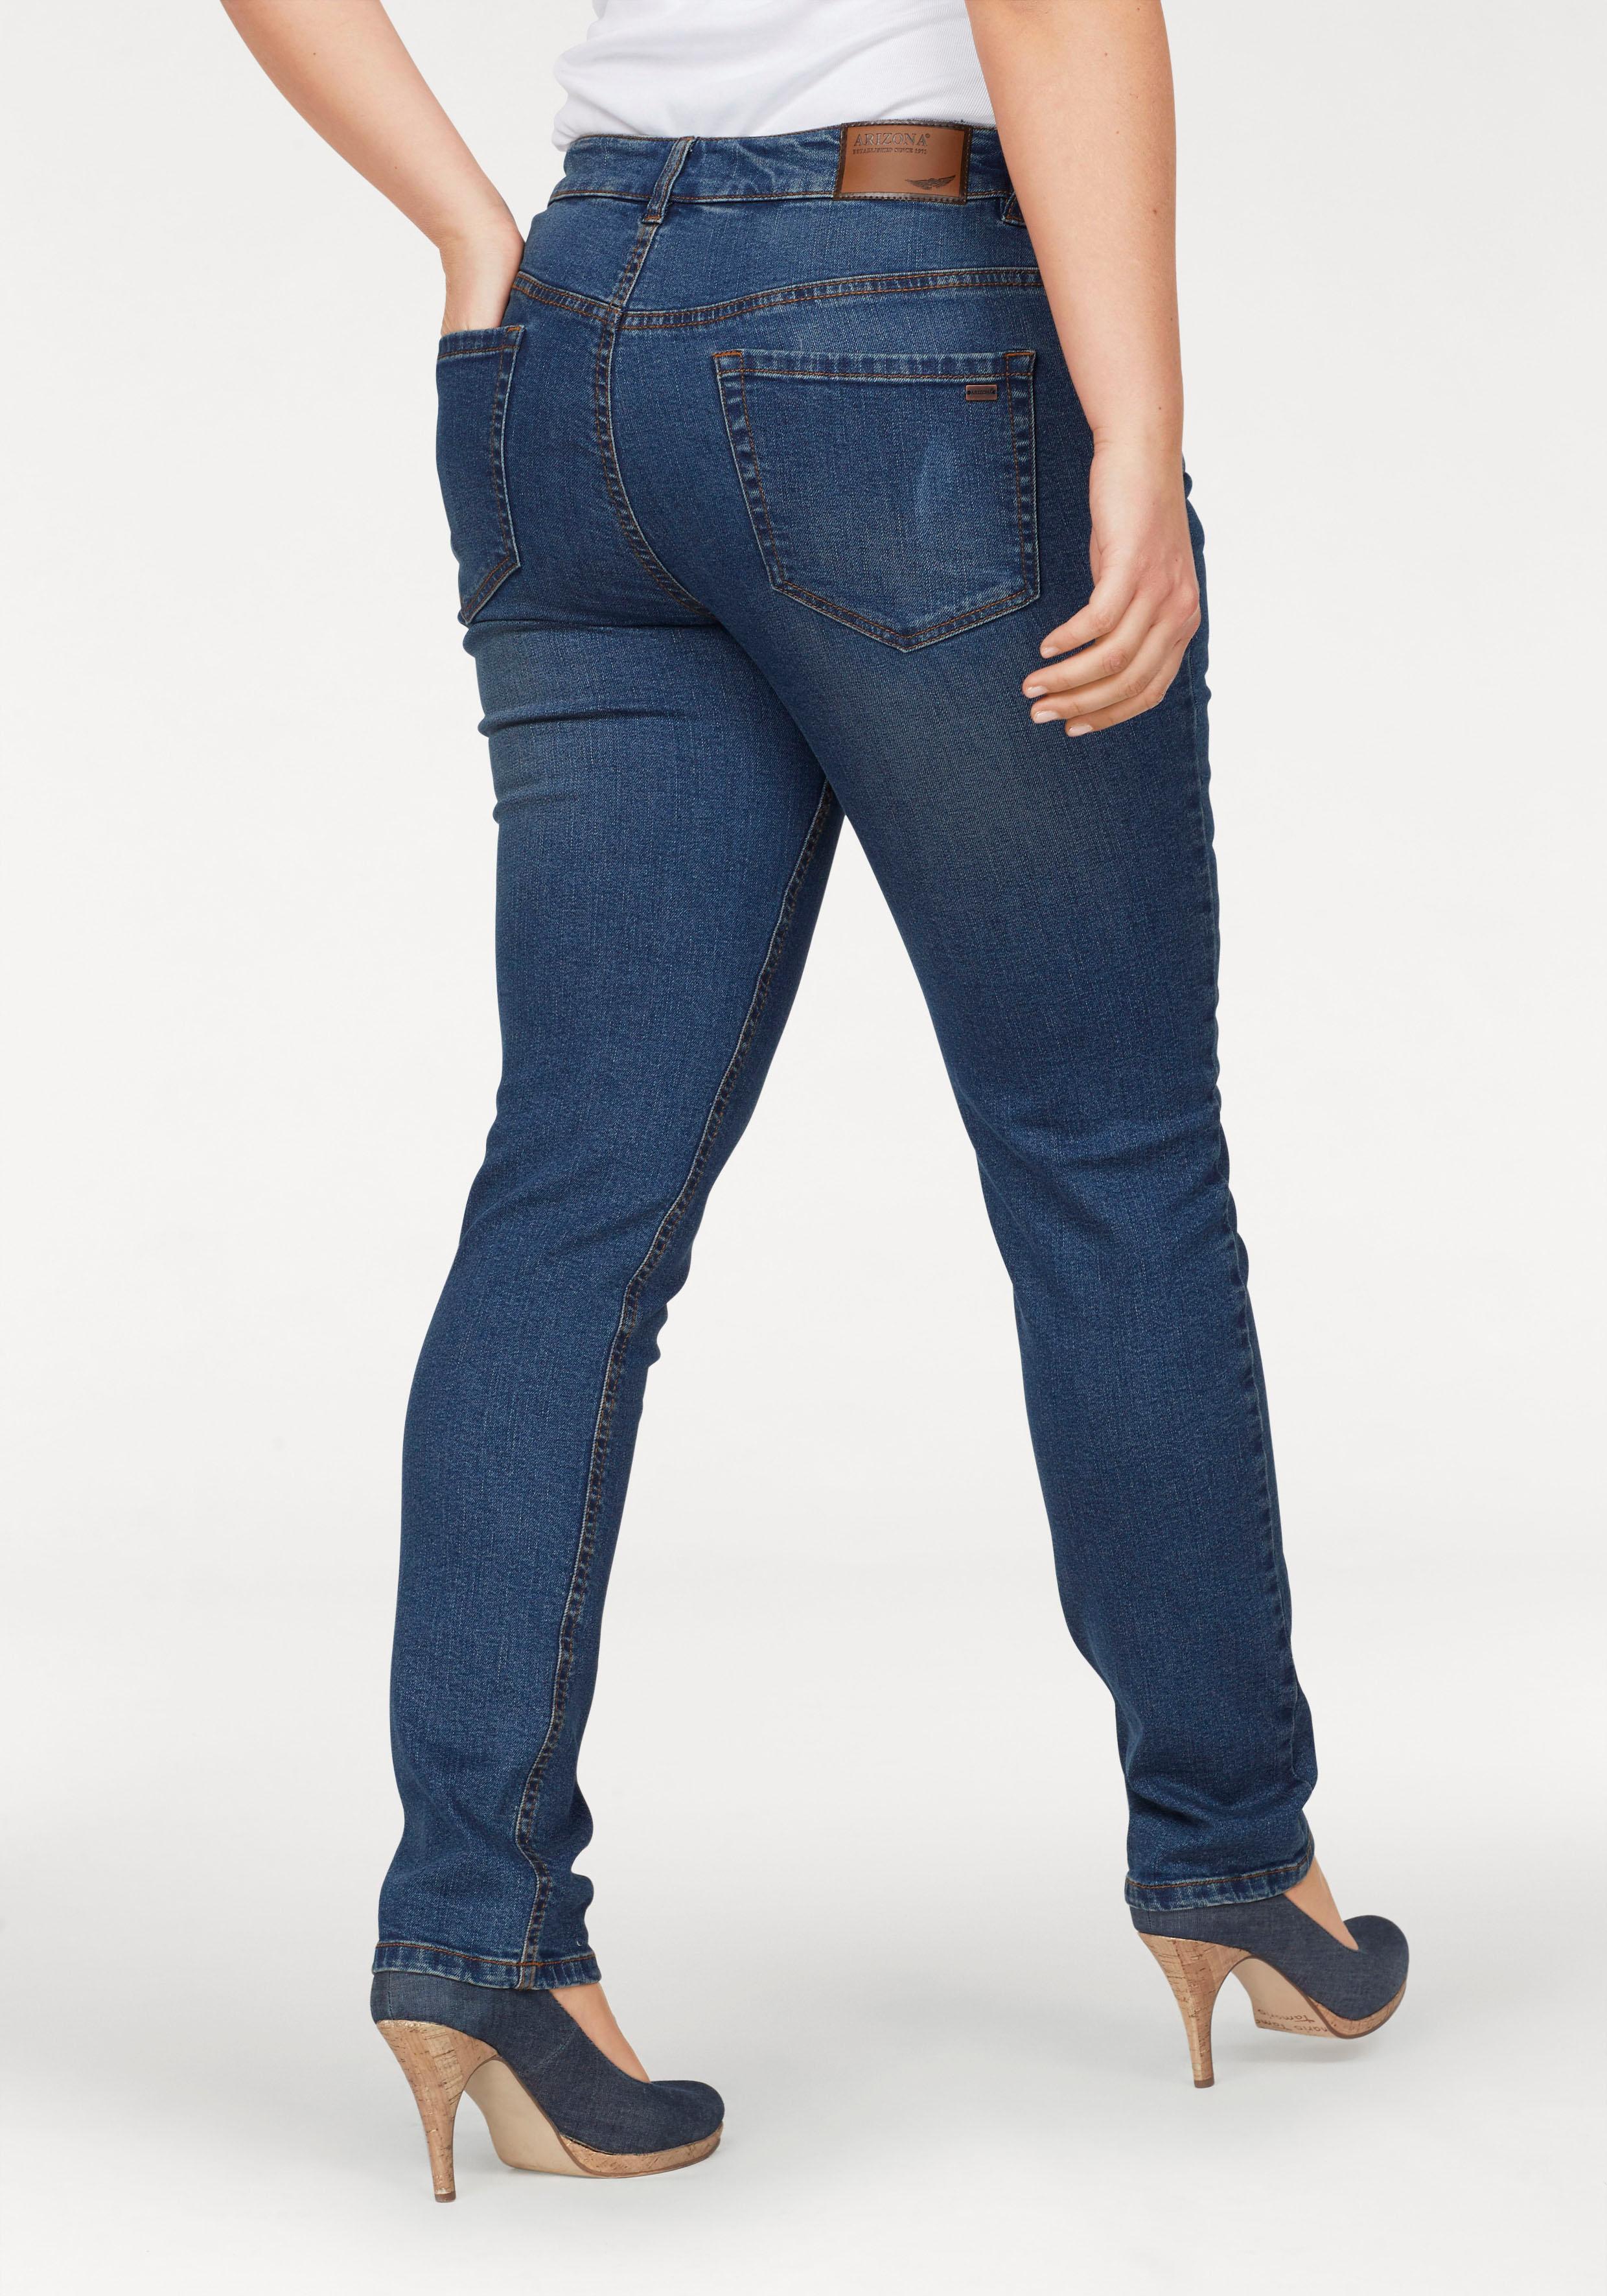 733e79c0664a3e Arizona Slim-fit-Jeans Svenja - Bund mit seitlichem Gummizugeinsatz